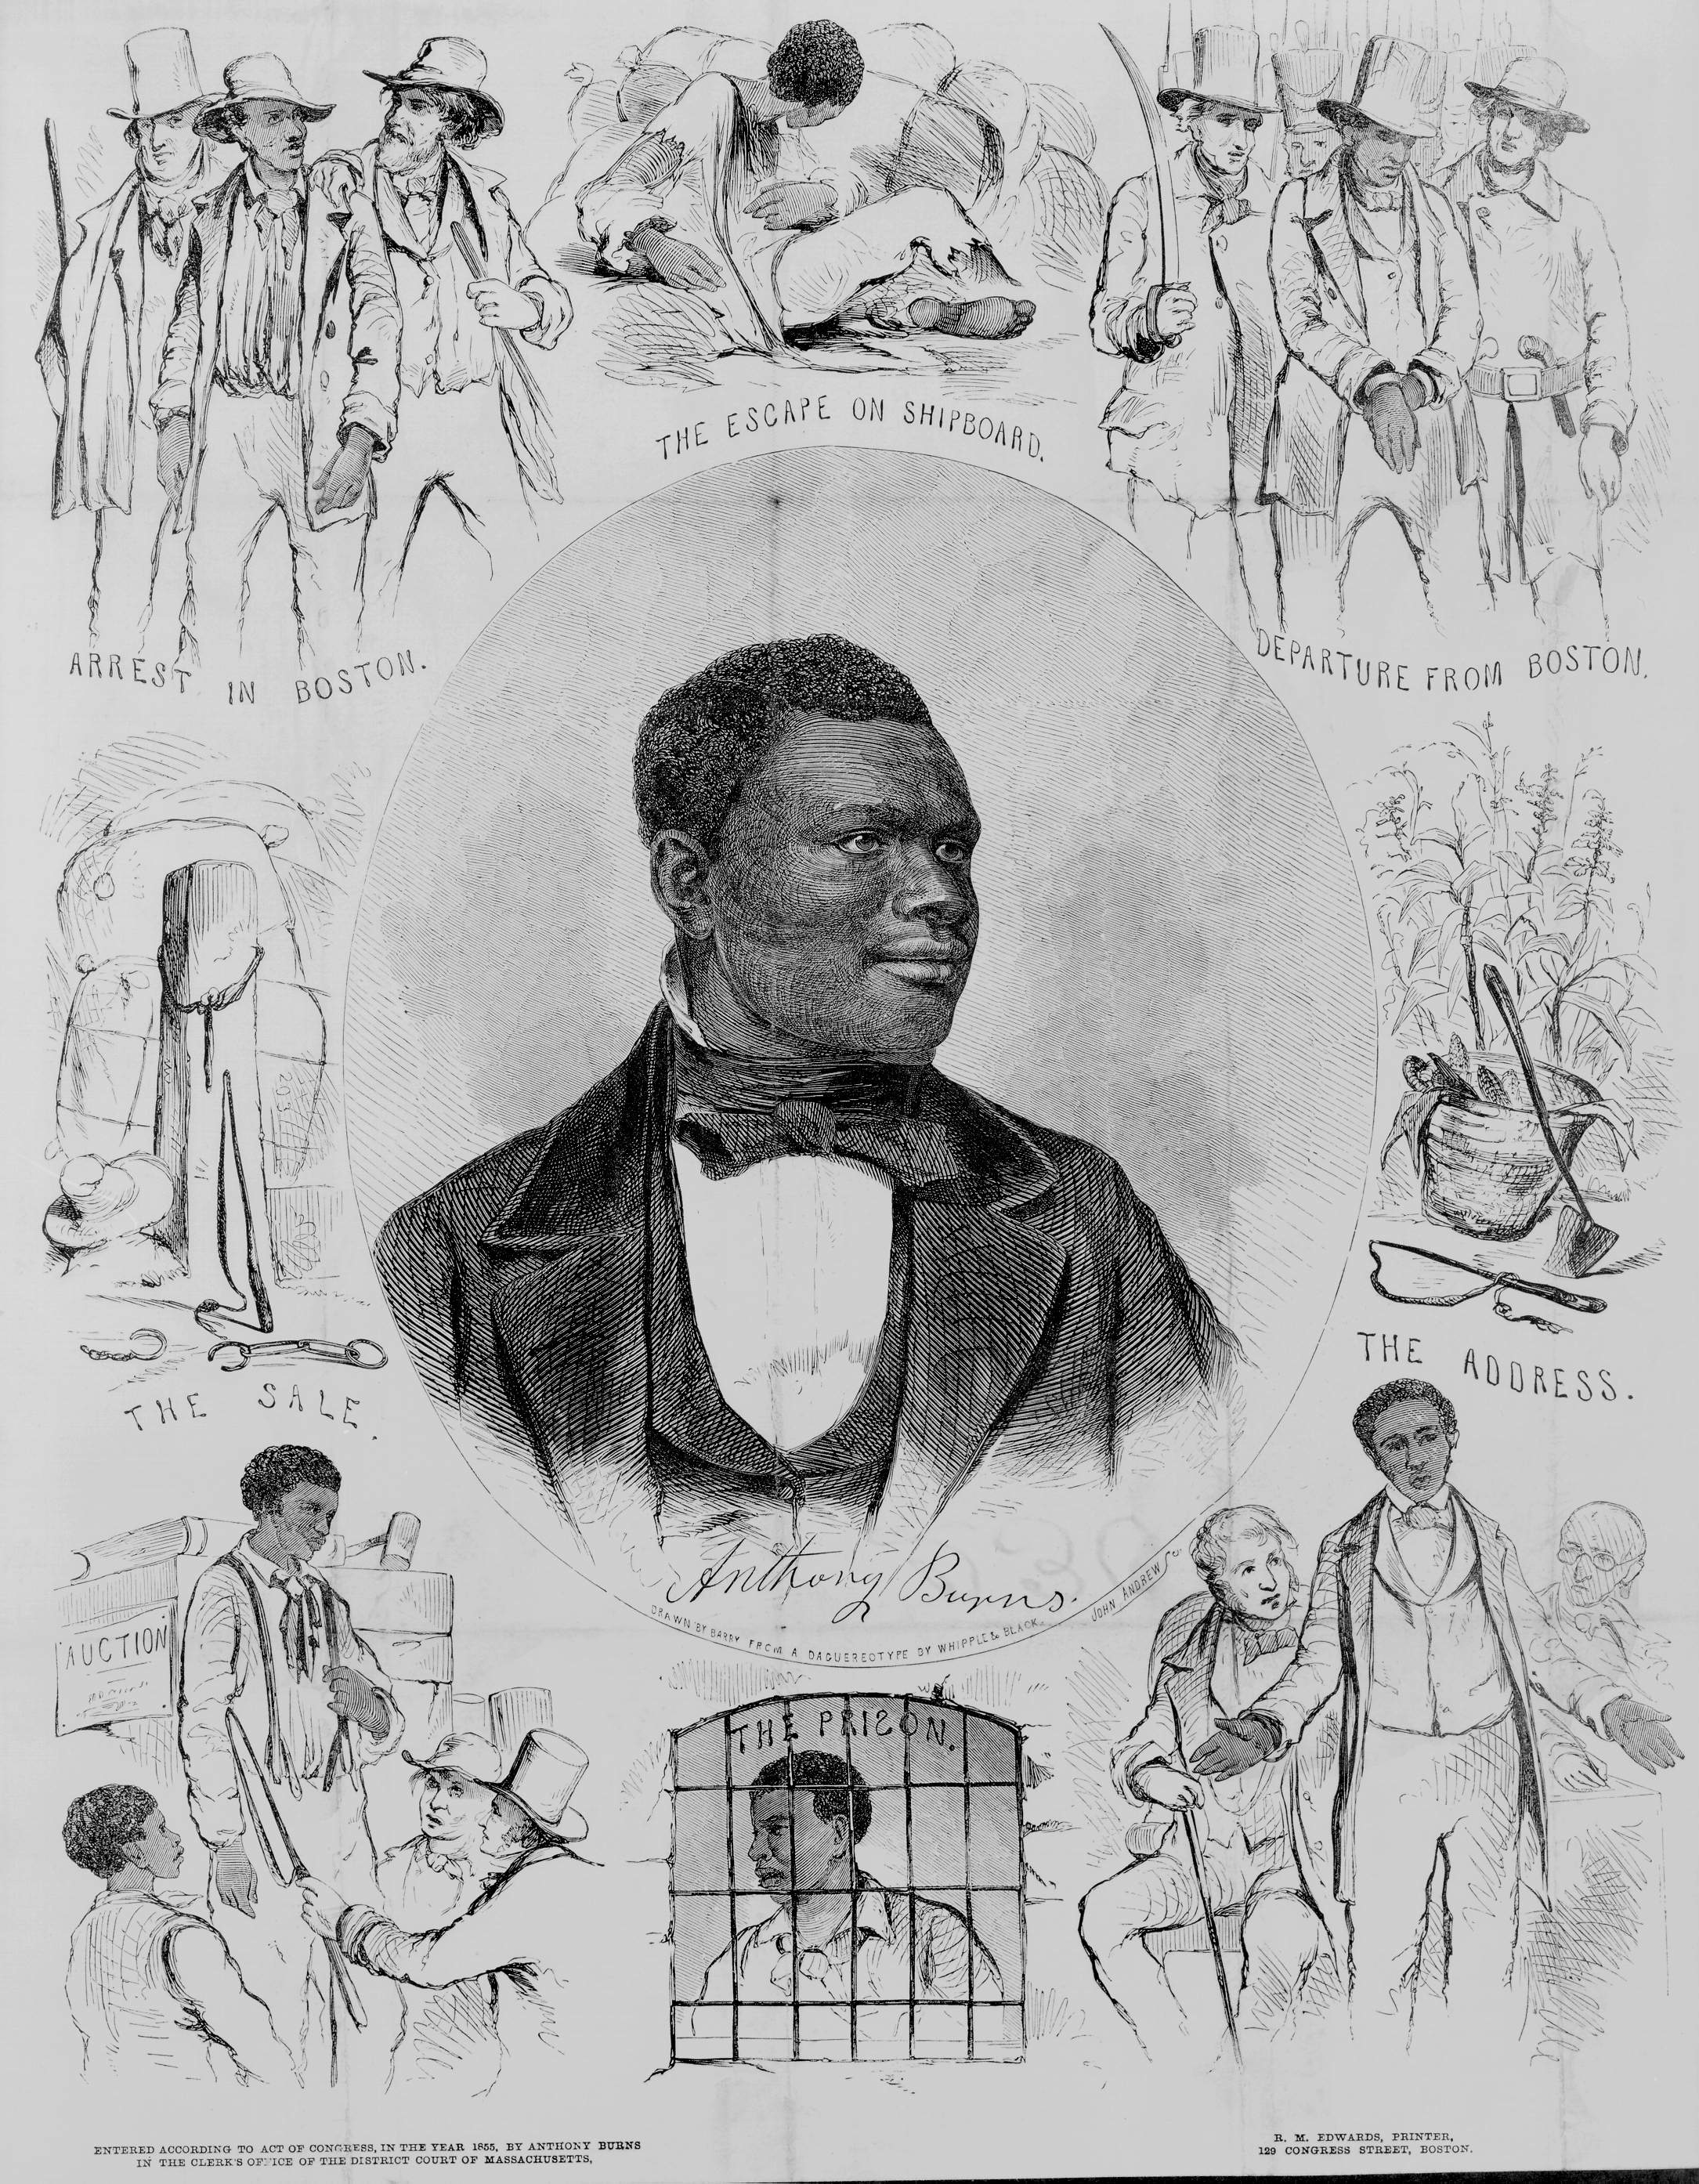 A  portrait  of Anthony Burns,Boston,R.M. Edwards, printer, 129 Congress Street, Boston, c1855.